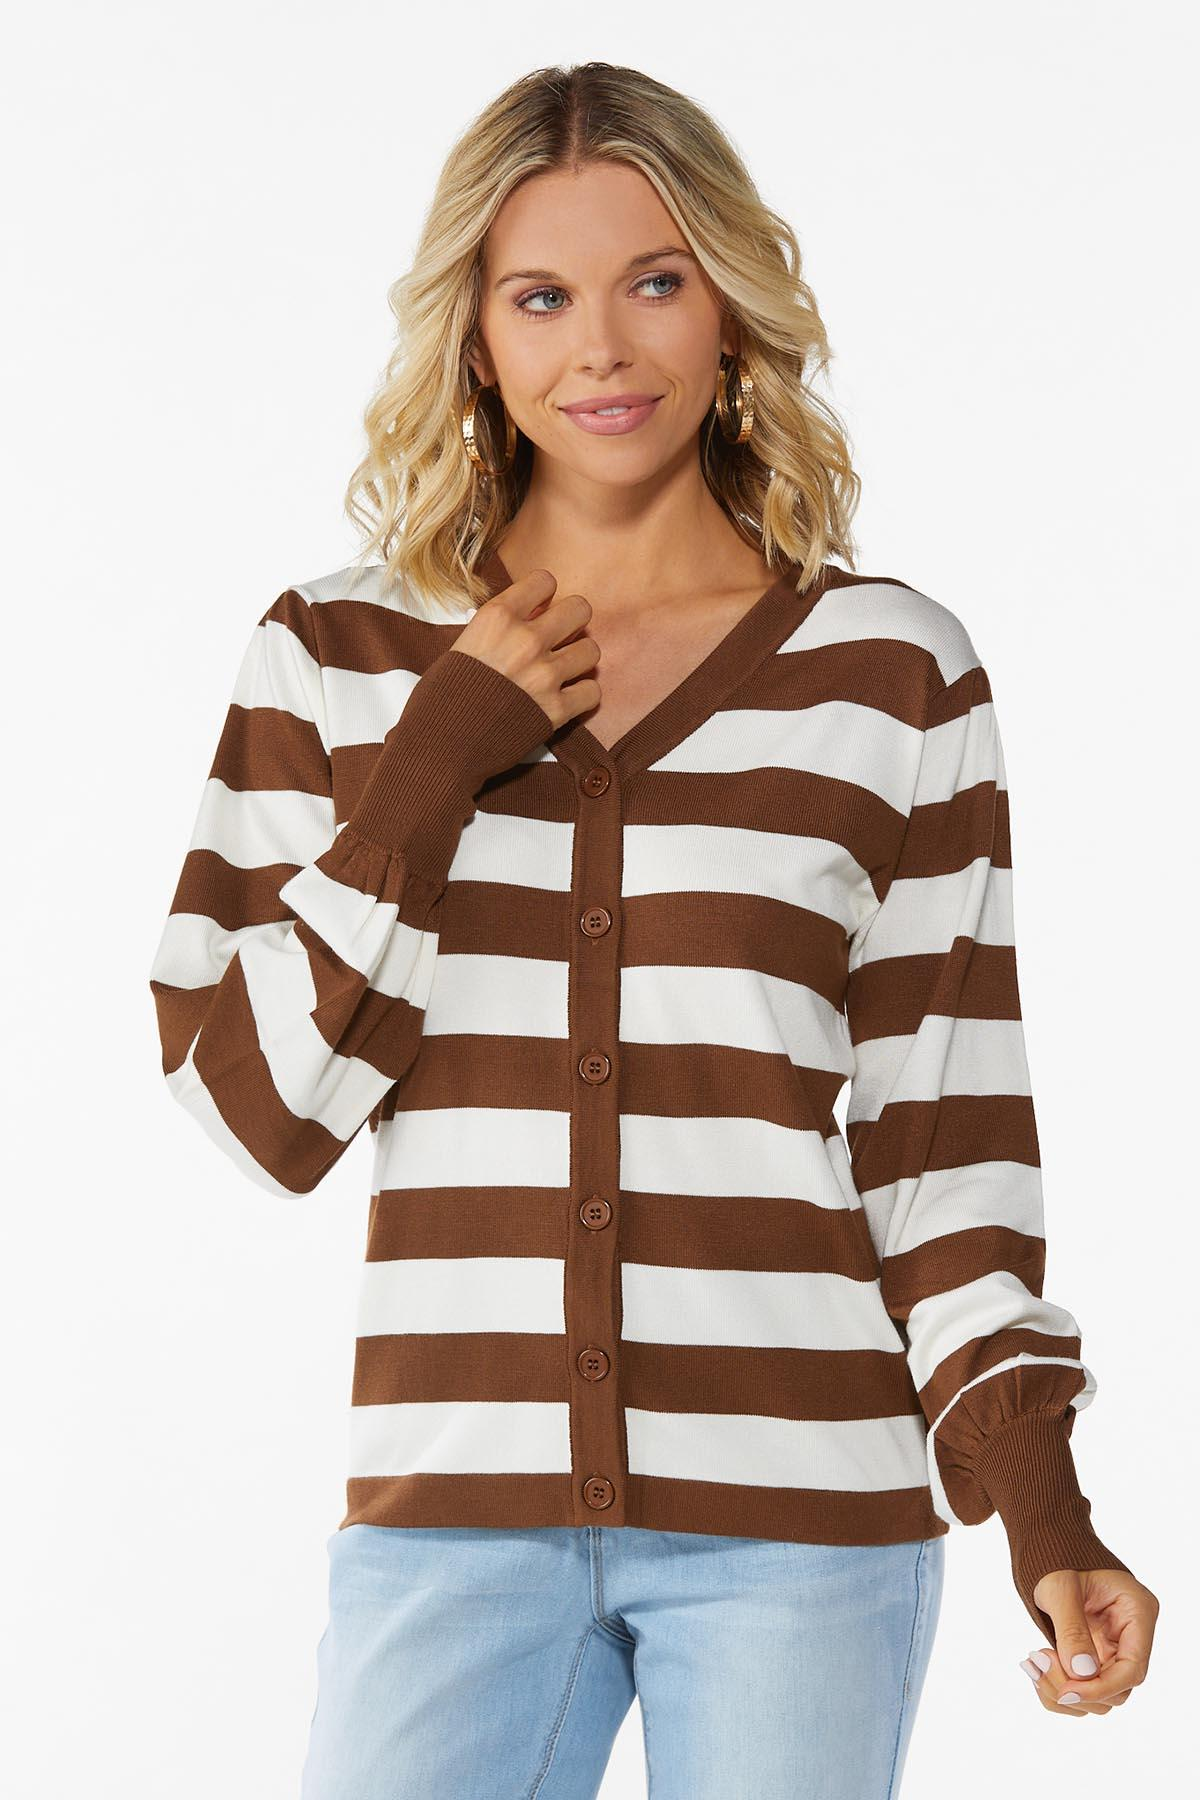 Caramel Latte Stripe Cardigan